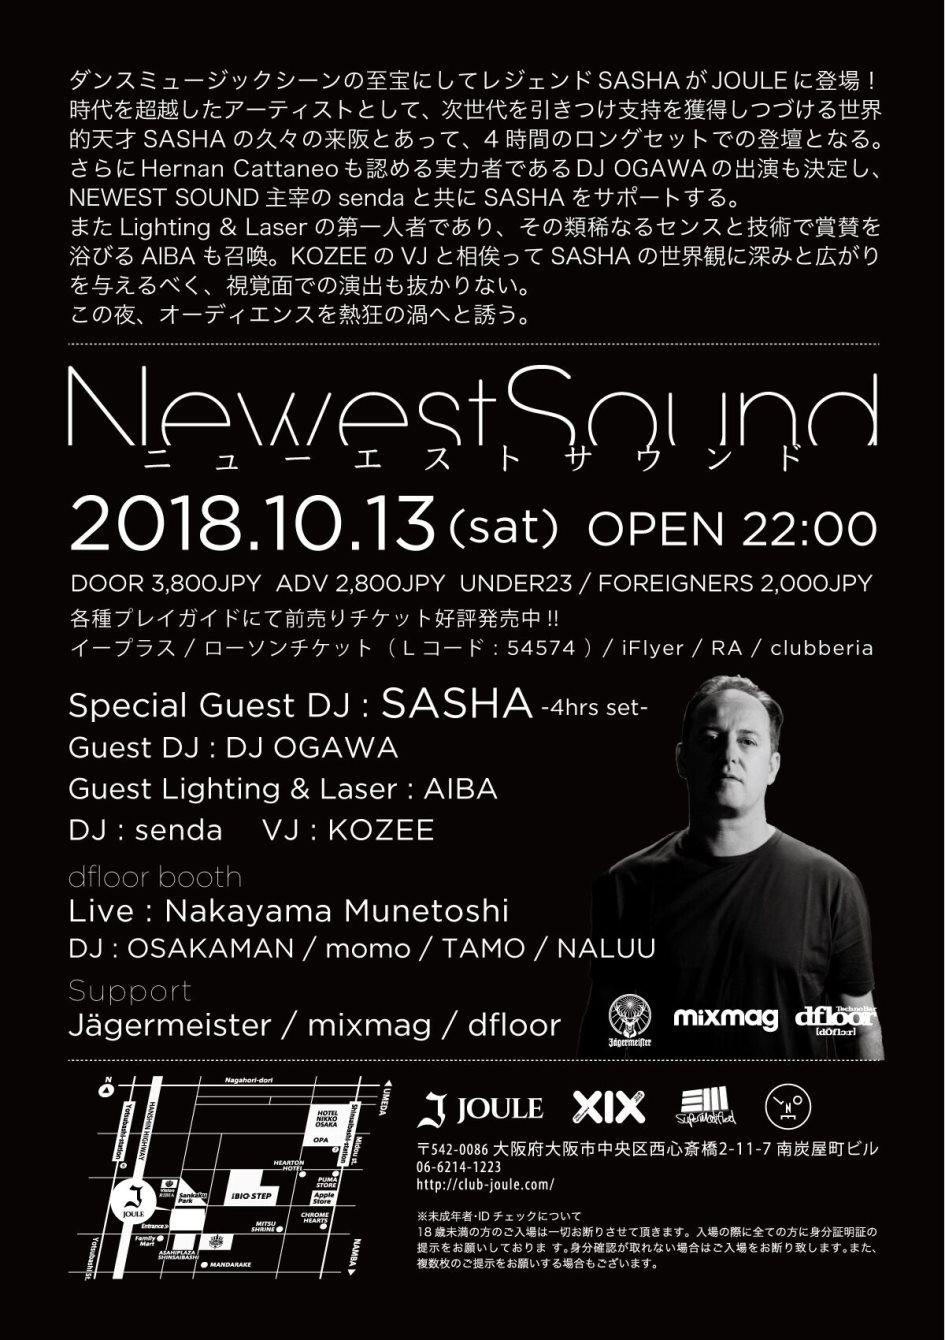 Newest Sound Feat.Sasha - Flyer back